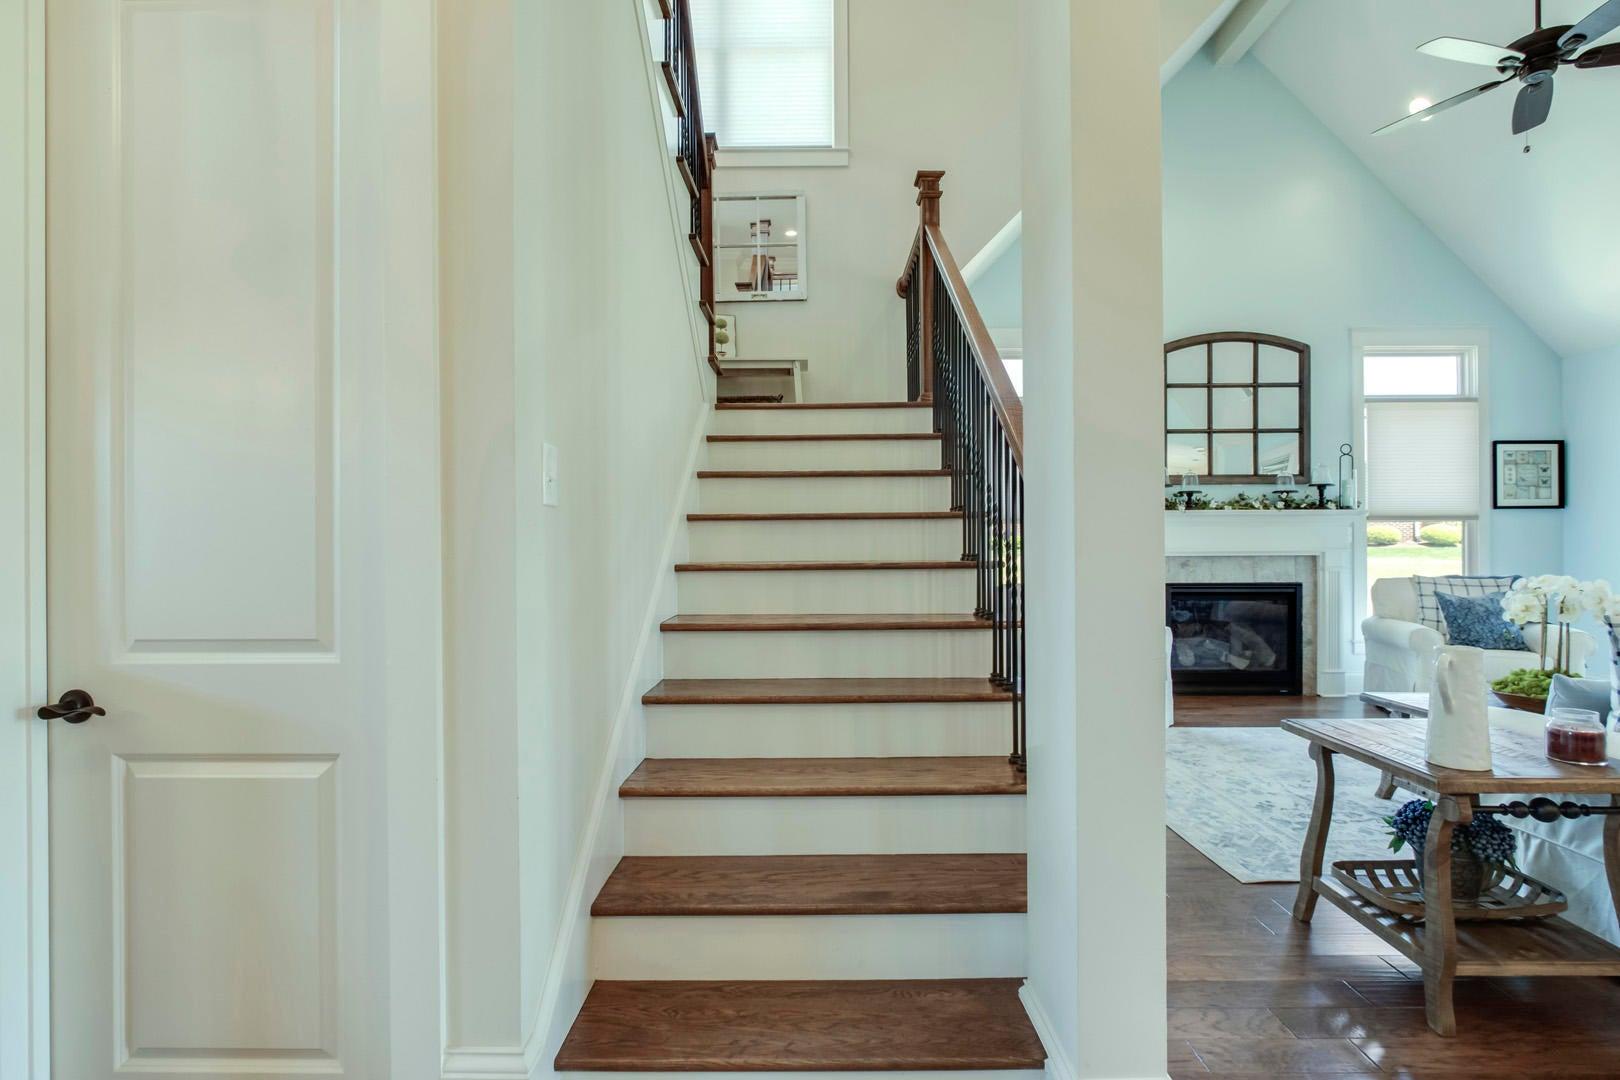 25_BuckhornWay_497_StairsUp